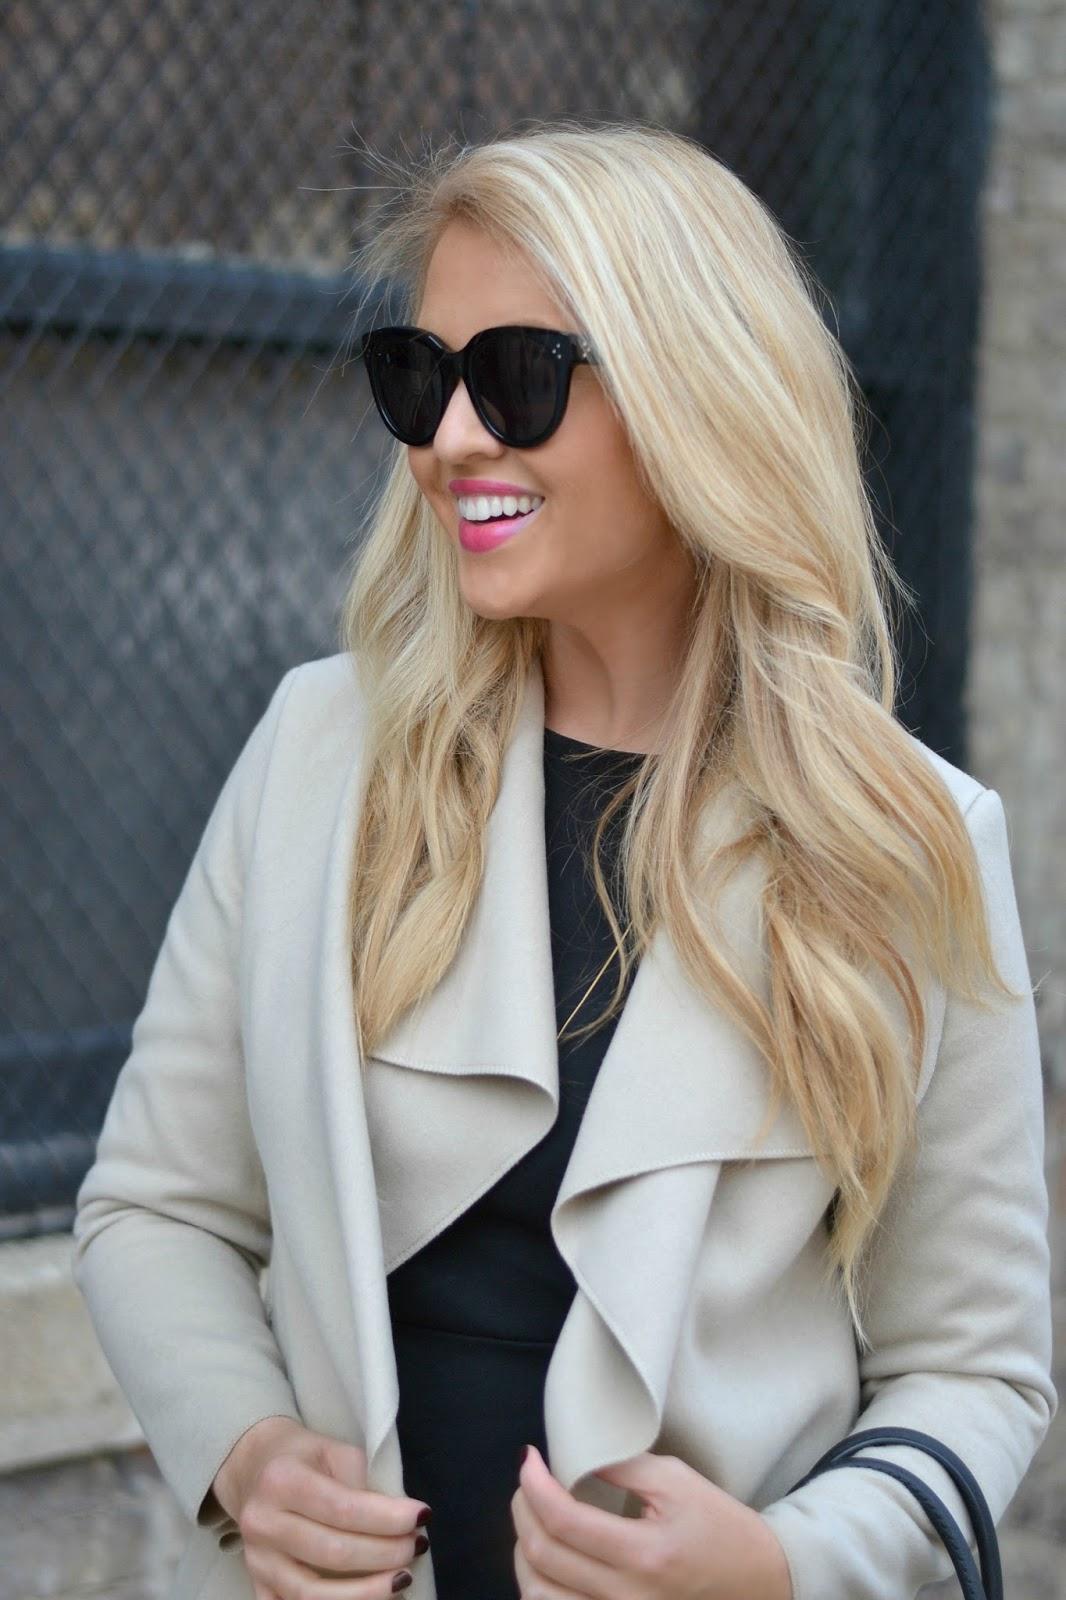 celine-audrey-sunglasses